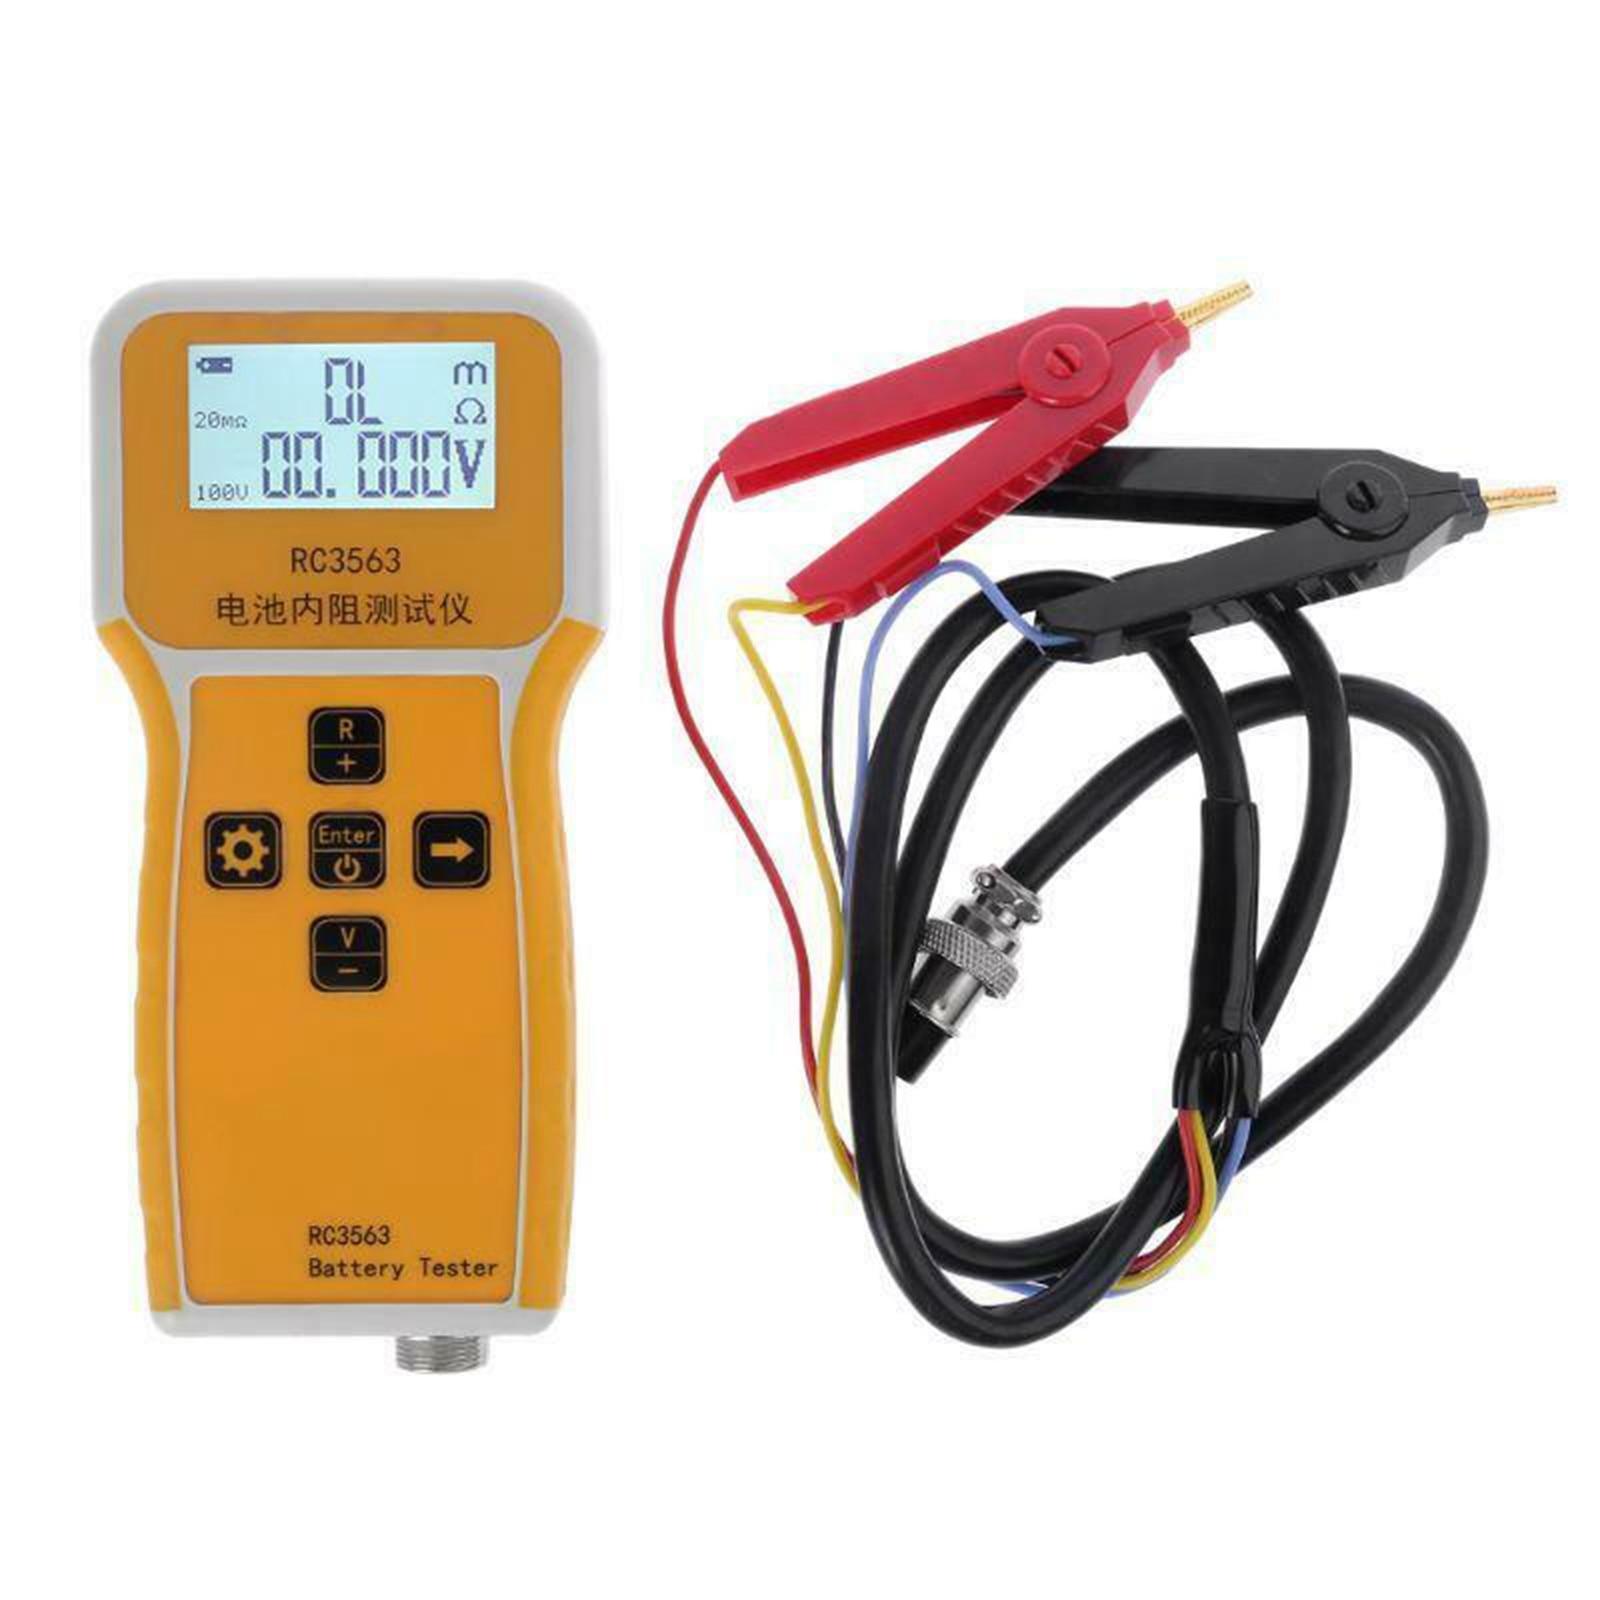 LCD 디스플레이 RC3563 휴대용 배터리 내부 저항 테스터 분석기 미터 전기 기기 테스트 클립 포함